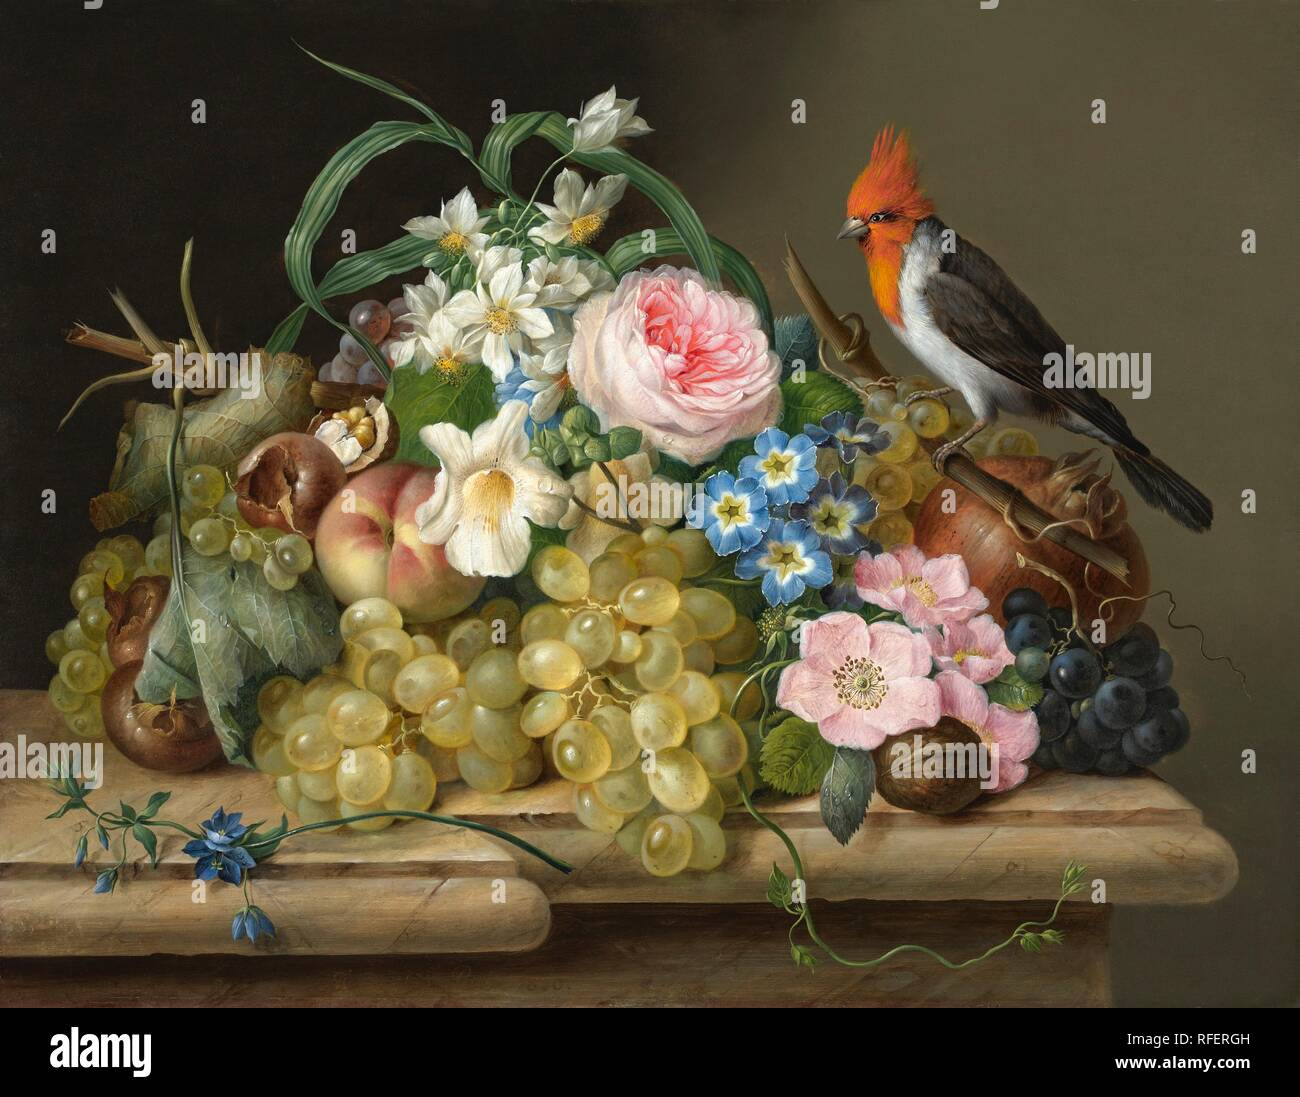 Franz Xaver Petter (1791 - Vienna - 1866), Two Flower Still Lifes, 1830.jpg - RFERGH - Stock Image